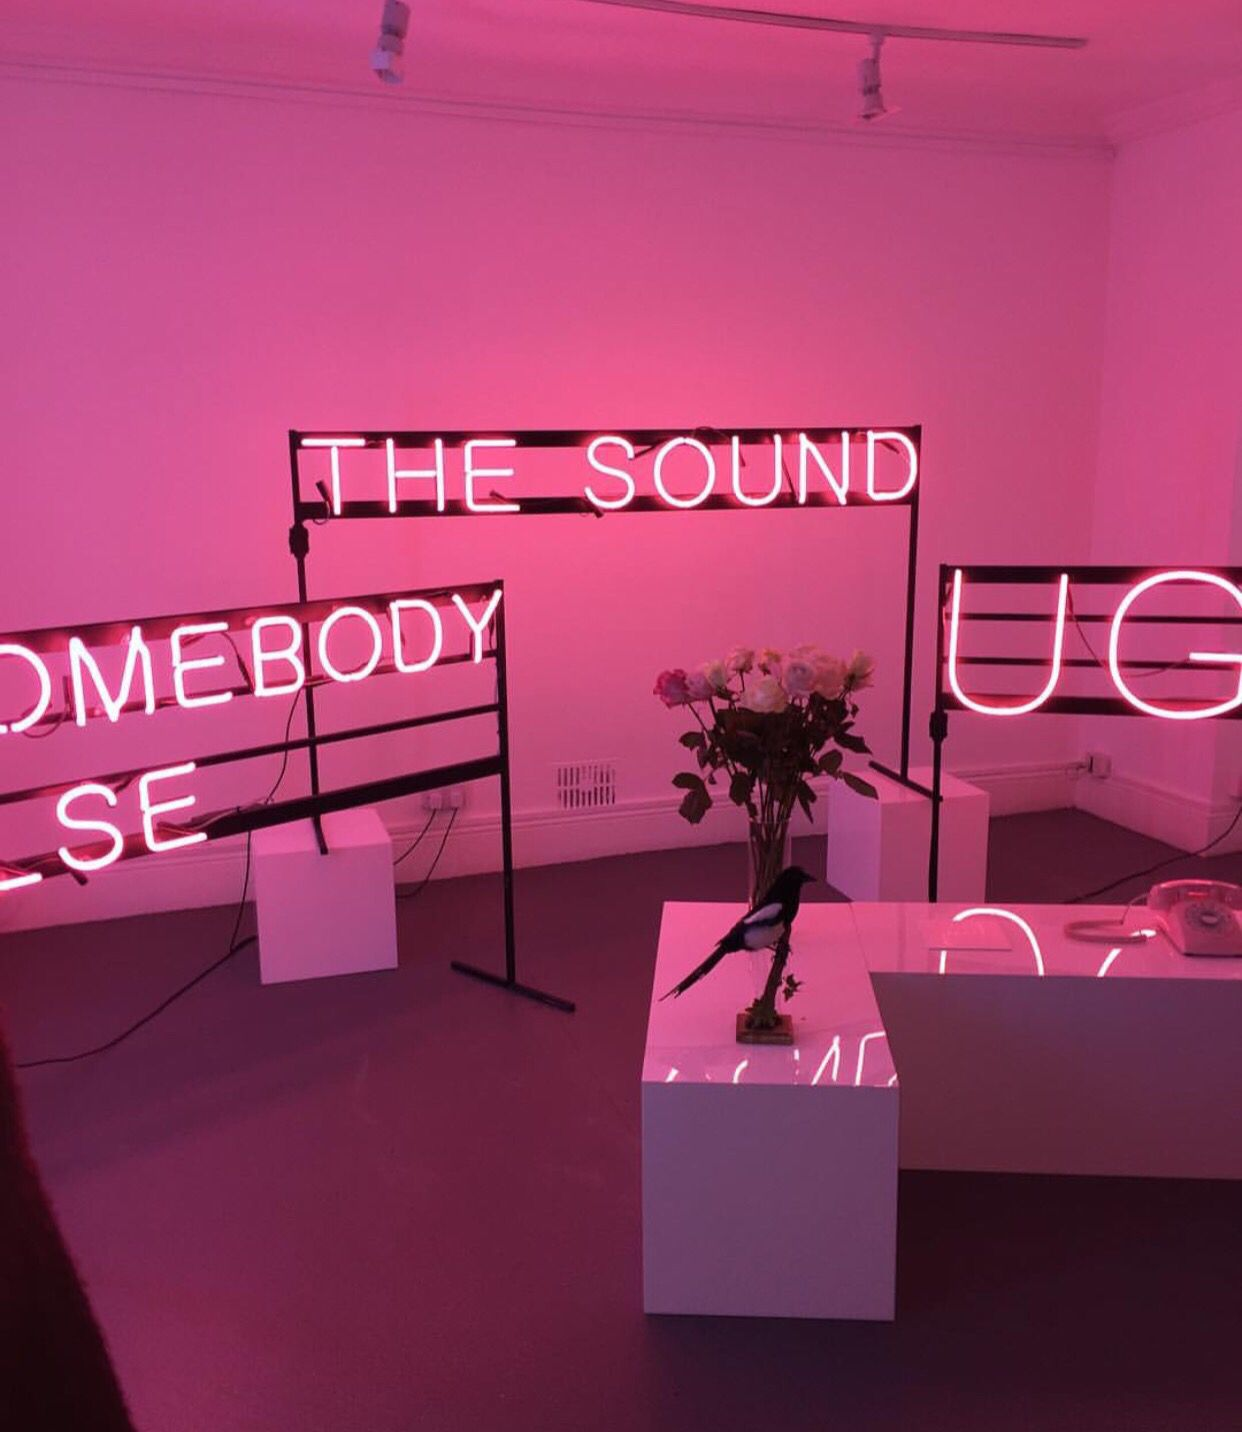 "The 1975 Neon Sign Magnificent ❀_""s̶a̶w̶ Y̶o̶u̶r̶ F̶a̶c̶e̶ A̶n̶d̶ G̶o̶t̶ I̶n̶s̶p̶i̶r̶e̶d̶_ Inspiration"